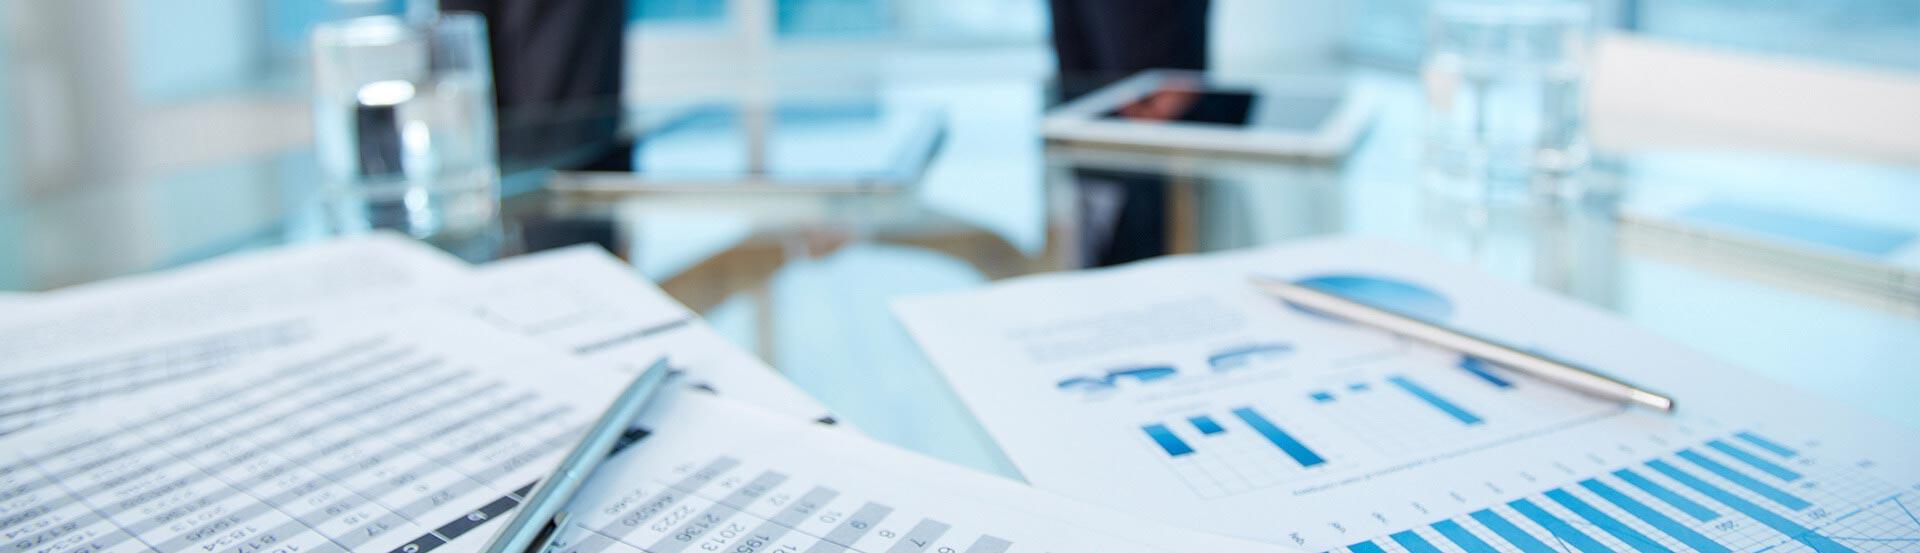 Easily manage online employee profit sharing plans